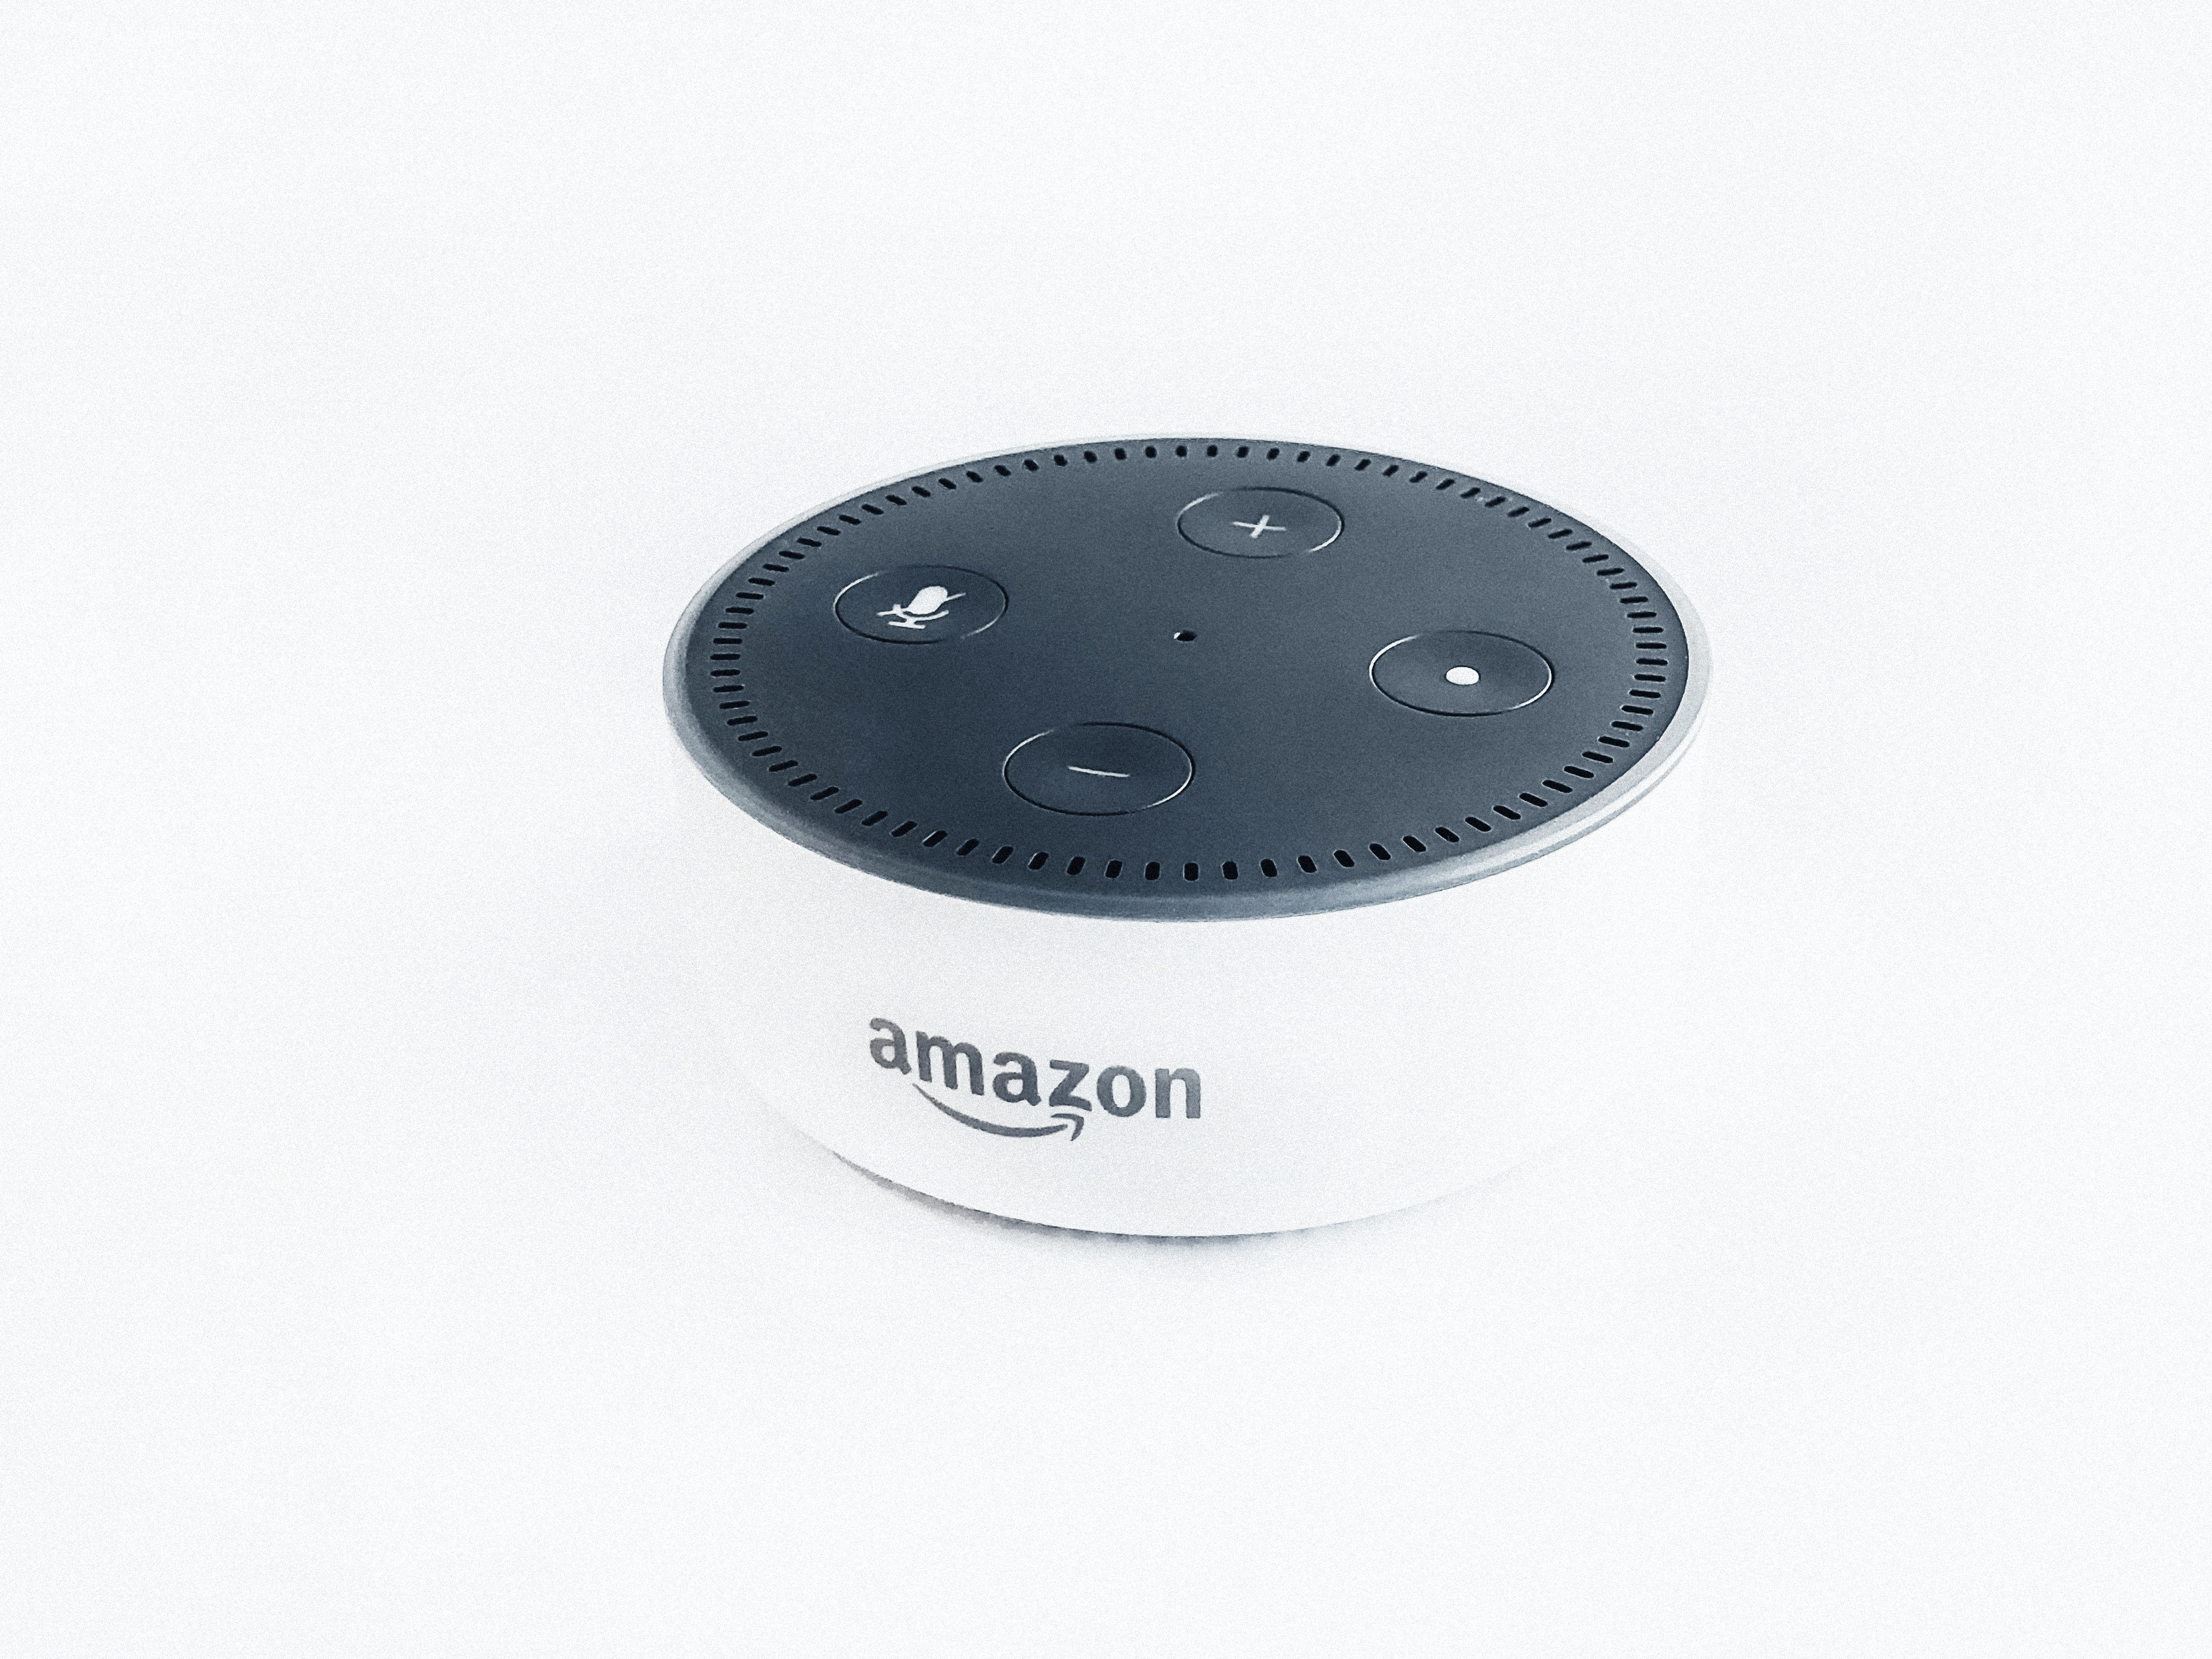 Amazon-alexa-healthcare-skills